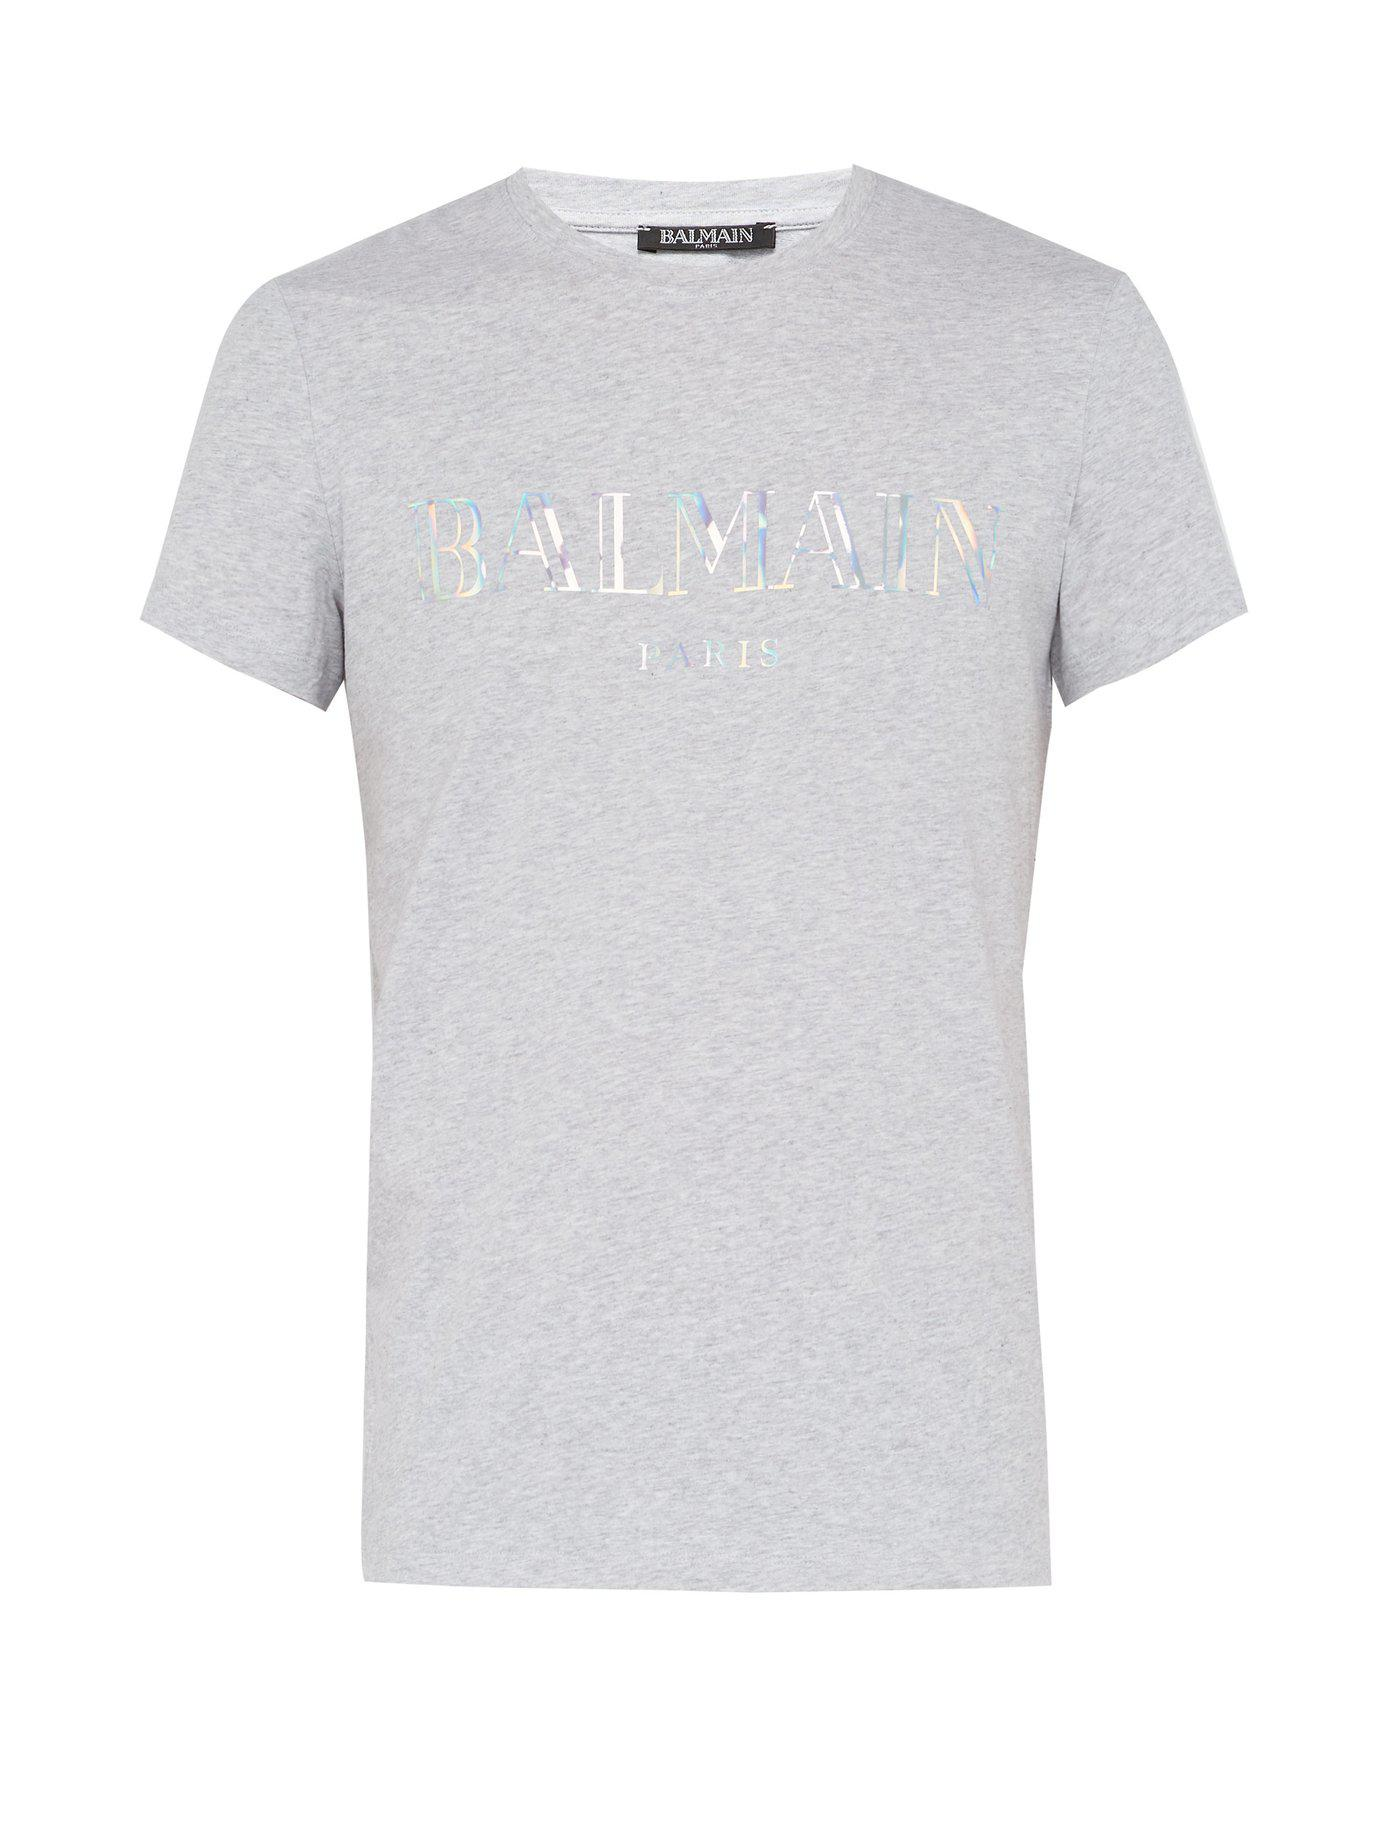 52e514ee Balmain - Gray Logo Print Cotton Jersey T Shirt for Men - Lyst. View  fullscreen